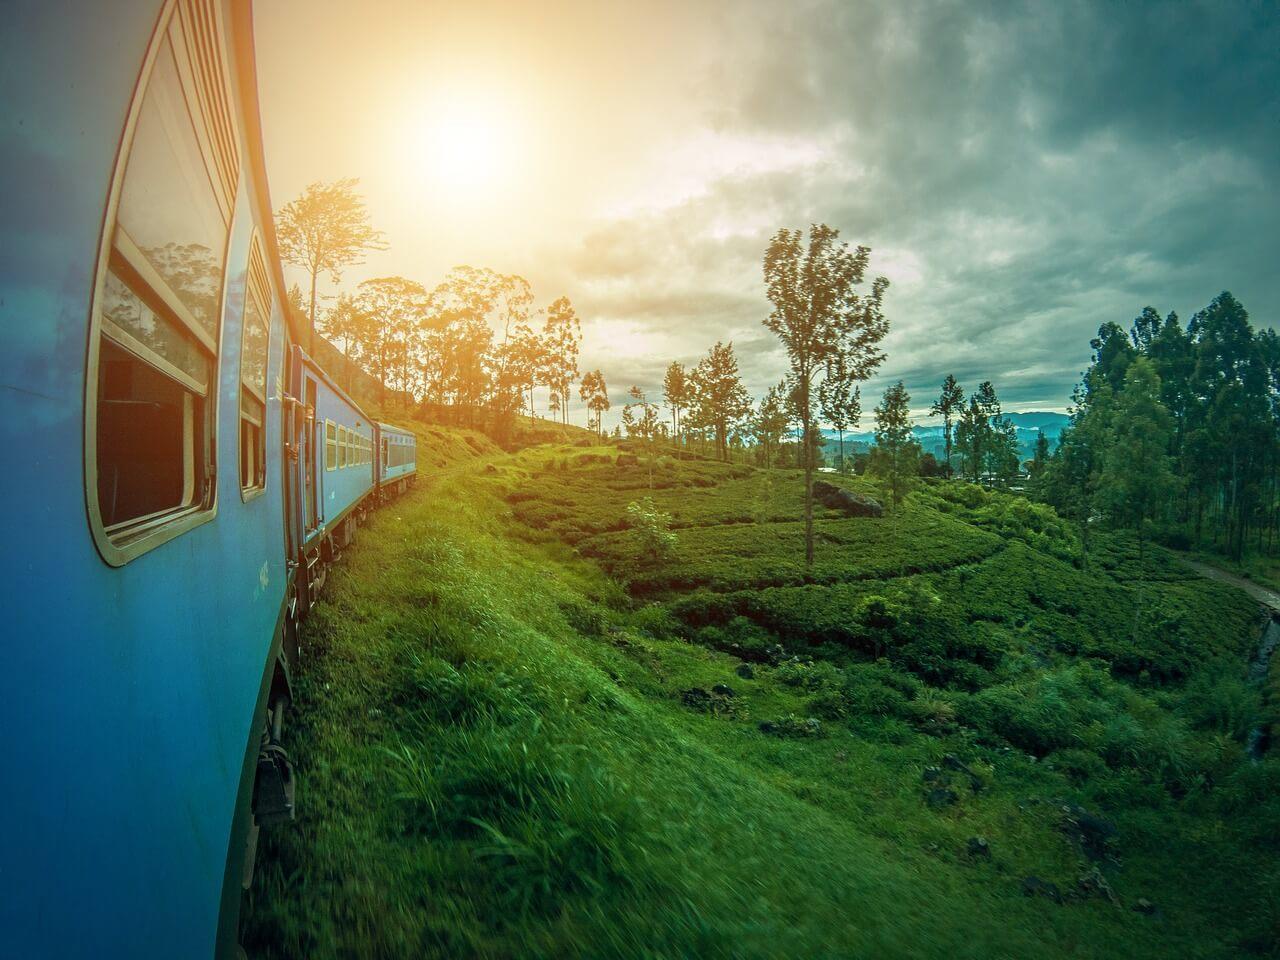 The Kandy to Ella train cutting through Sri Lanka's hill country